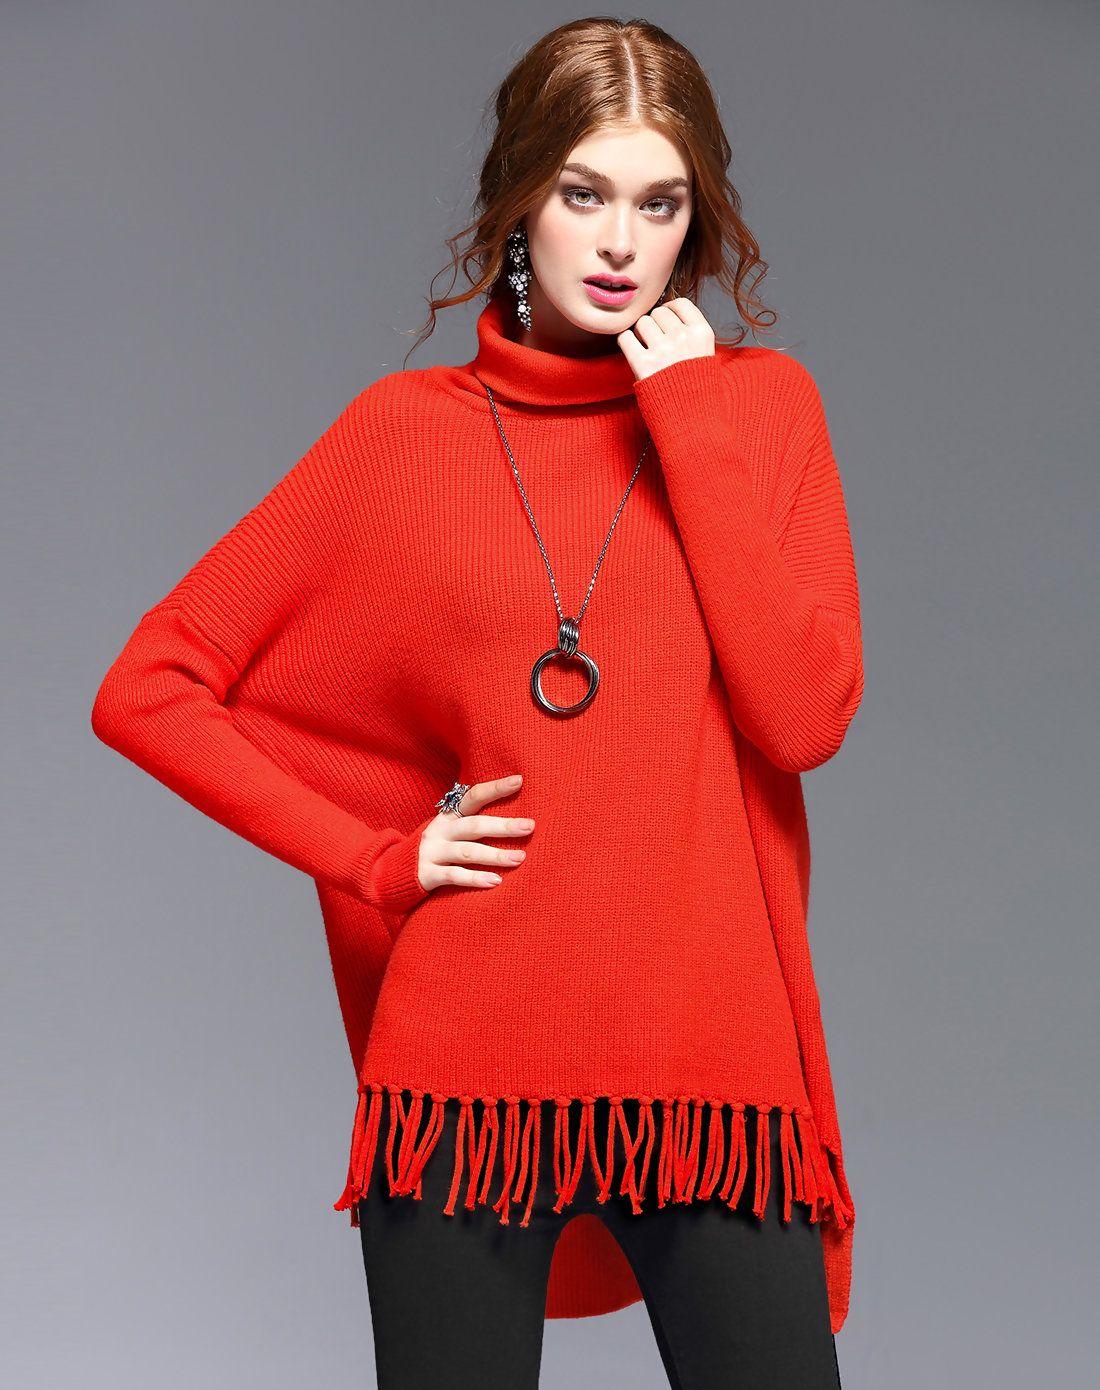 AdoreWe #VIPme Sweaters & Cardigans - DAIPYA Orange Red Batwing ...